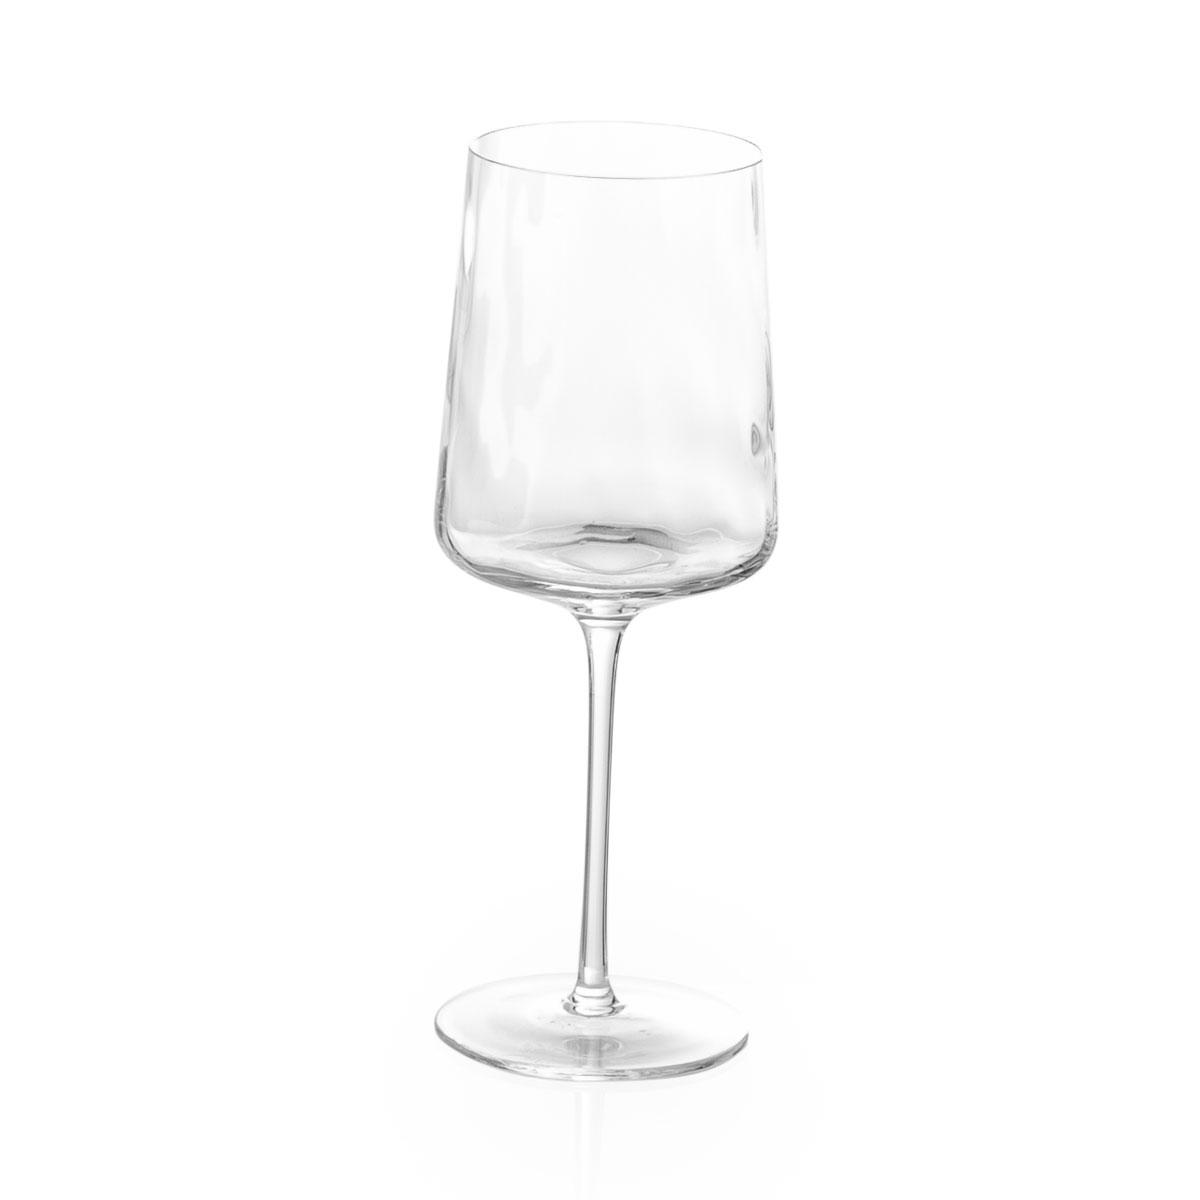 Michael Aram Ripple Effect Wine Glass, Single